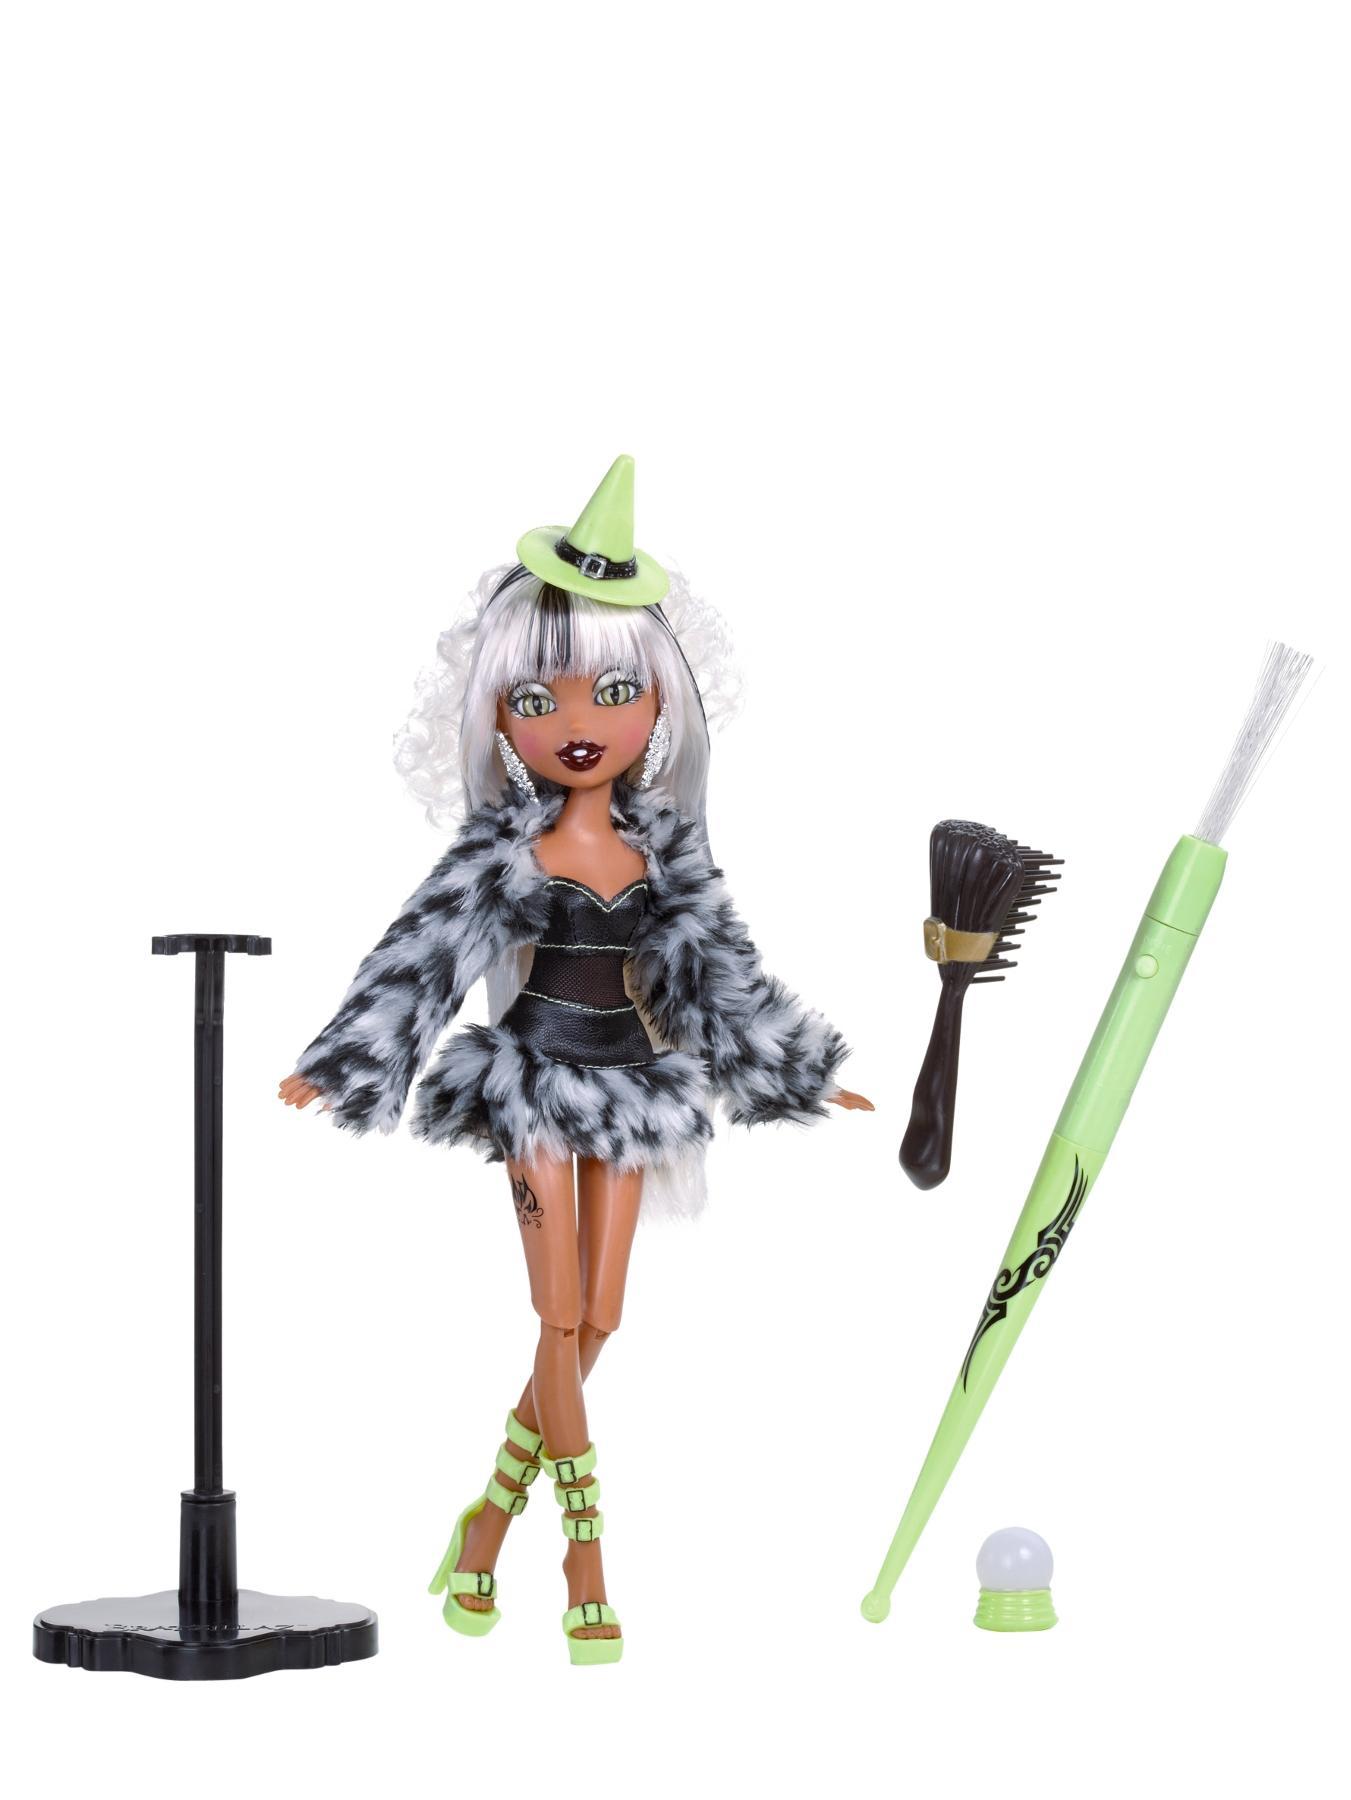 Bratzillaz Magic Night Out Doll - Sashabella Paws